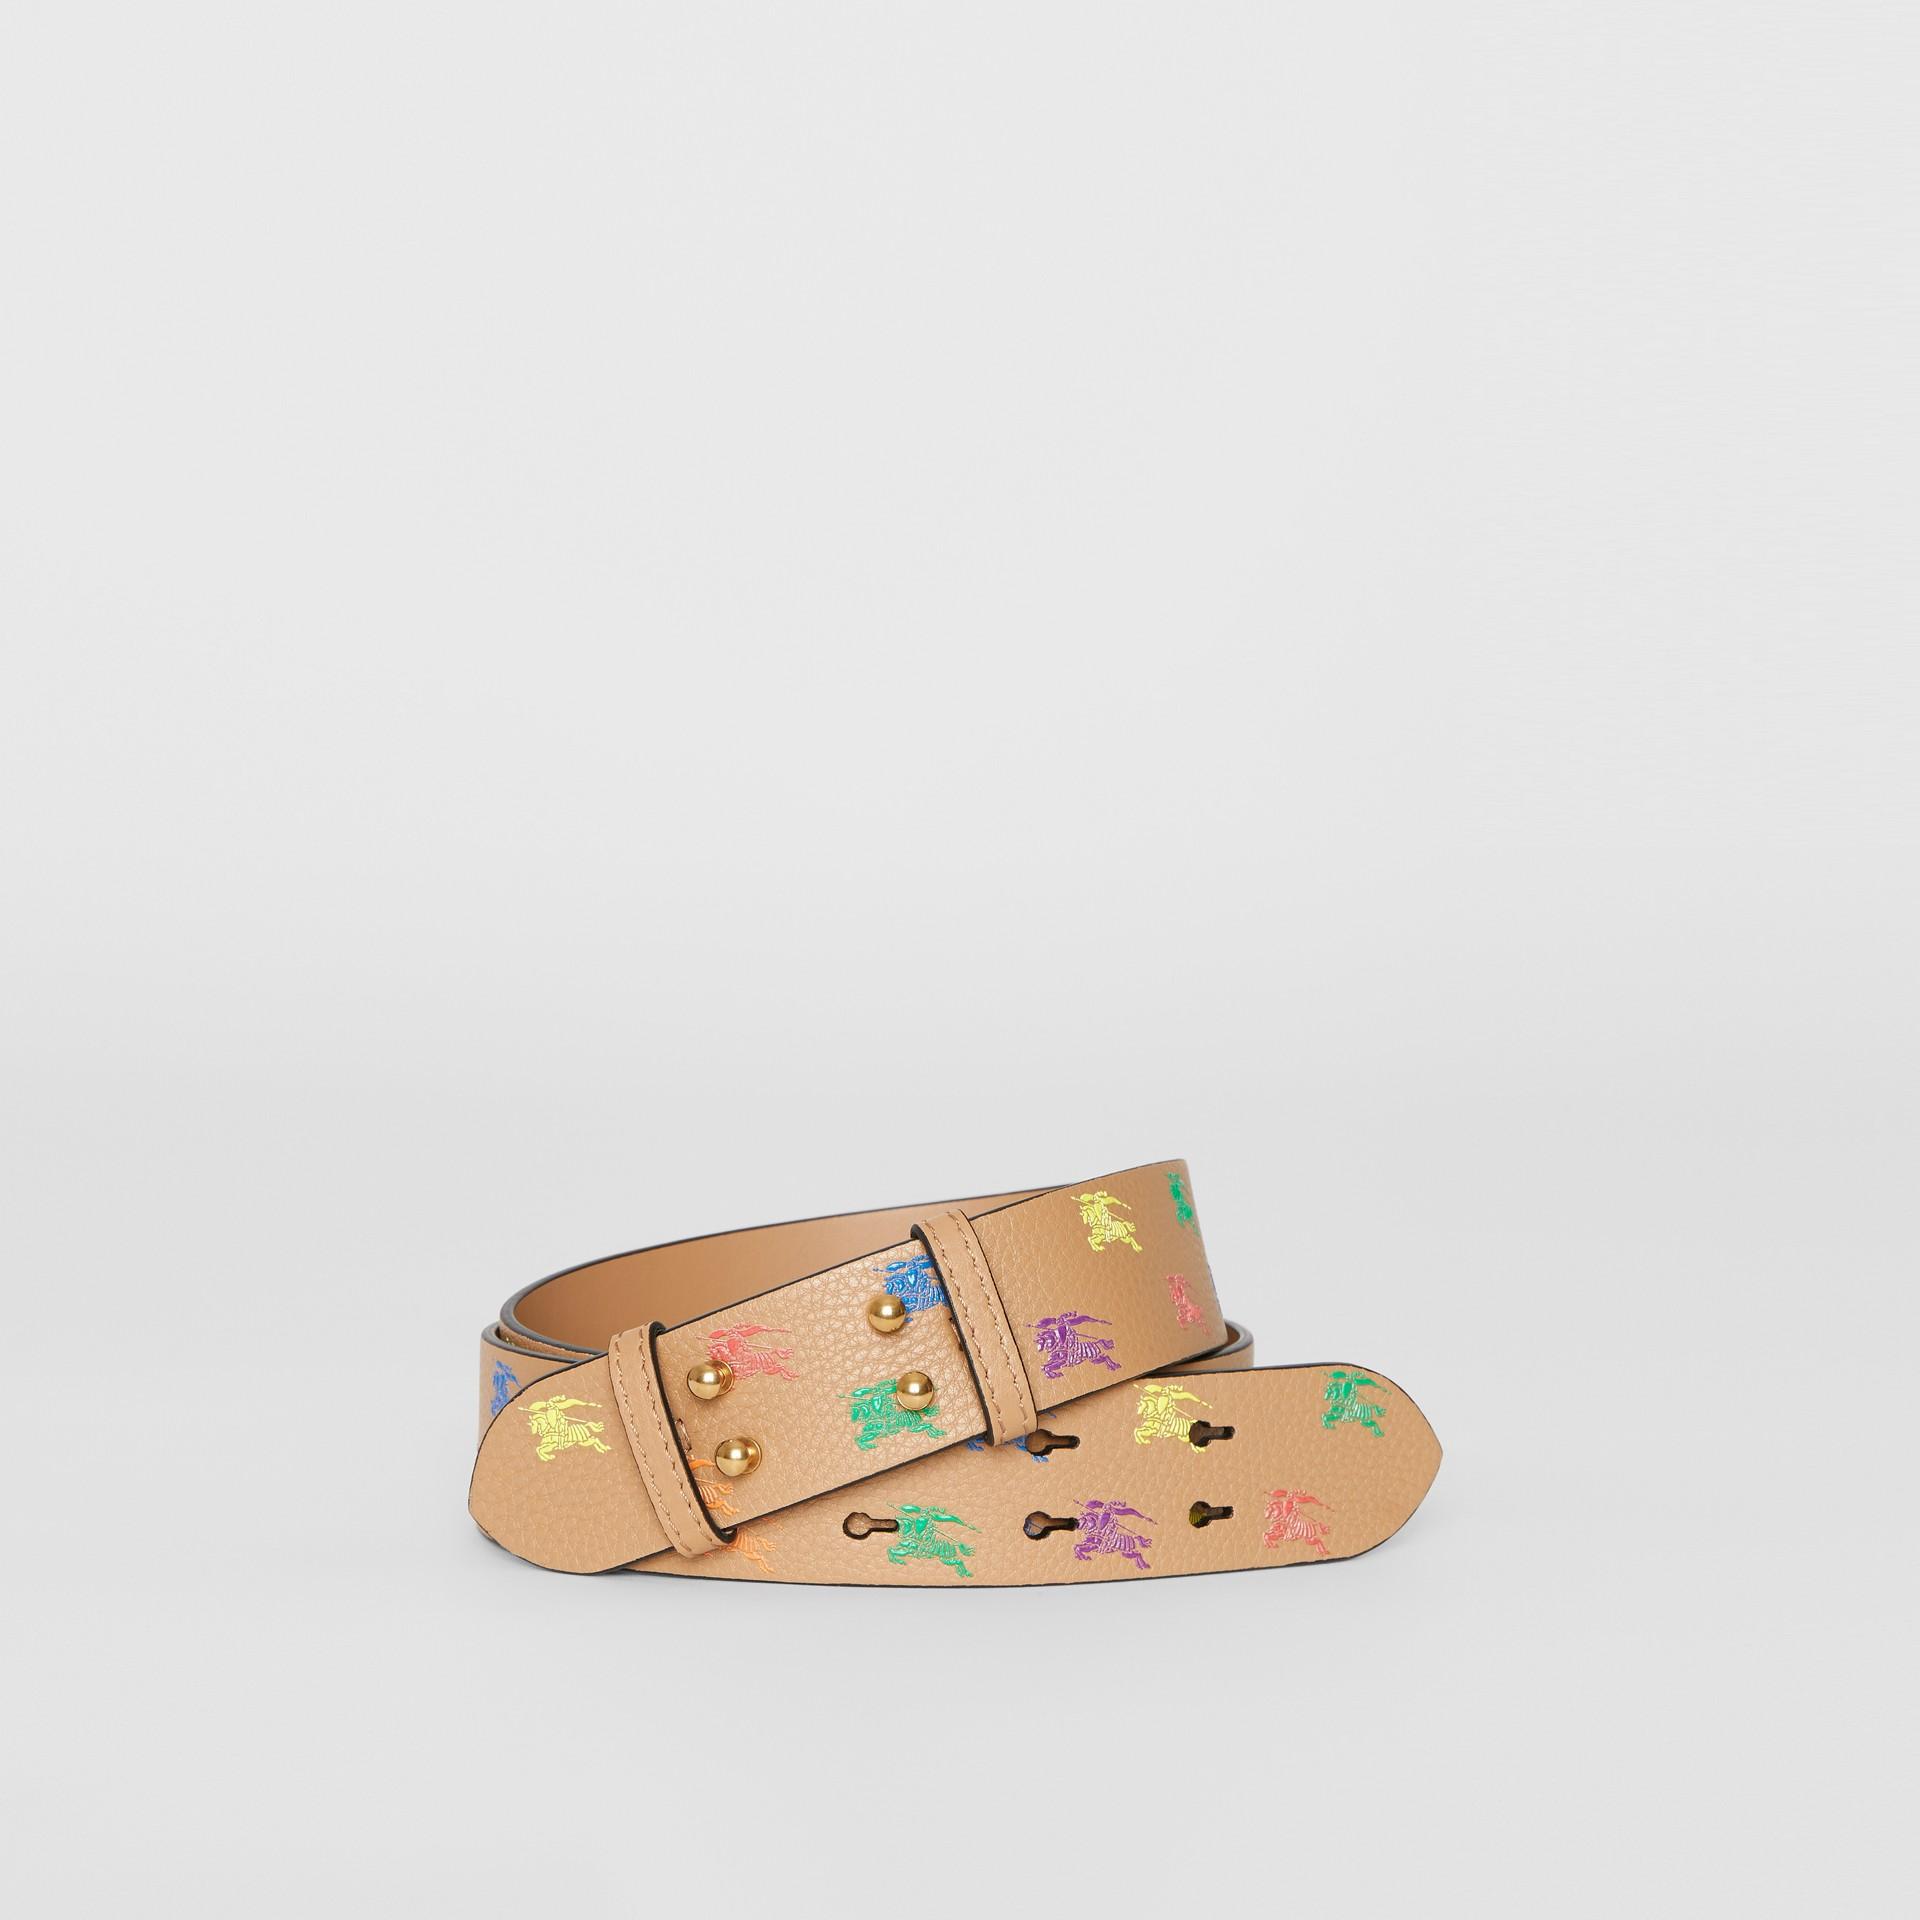 Ledergürtel mit Ritteremblem für The Medium Belt Bag (Helles Camelfarben) - Damen | Burberry - Galerie-Bild 0